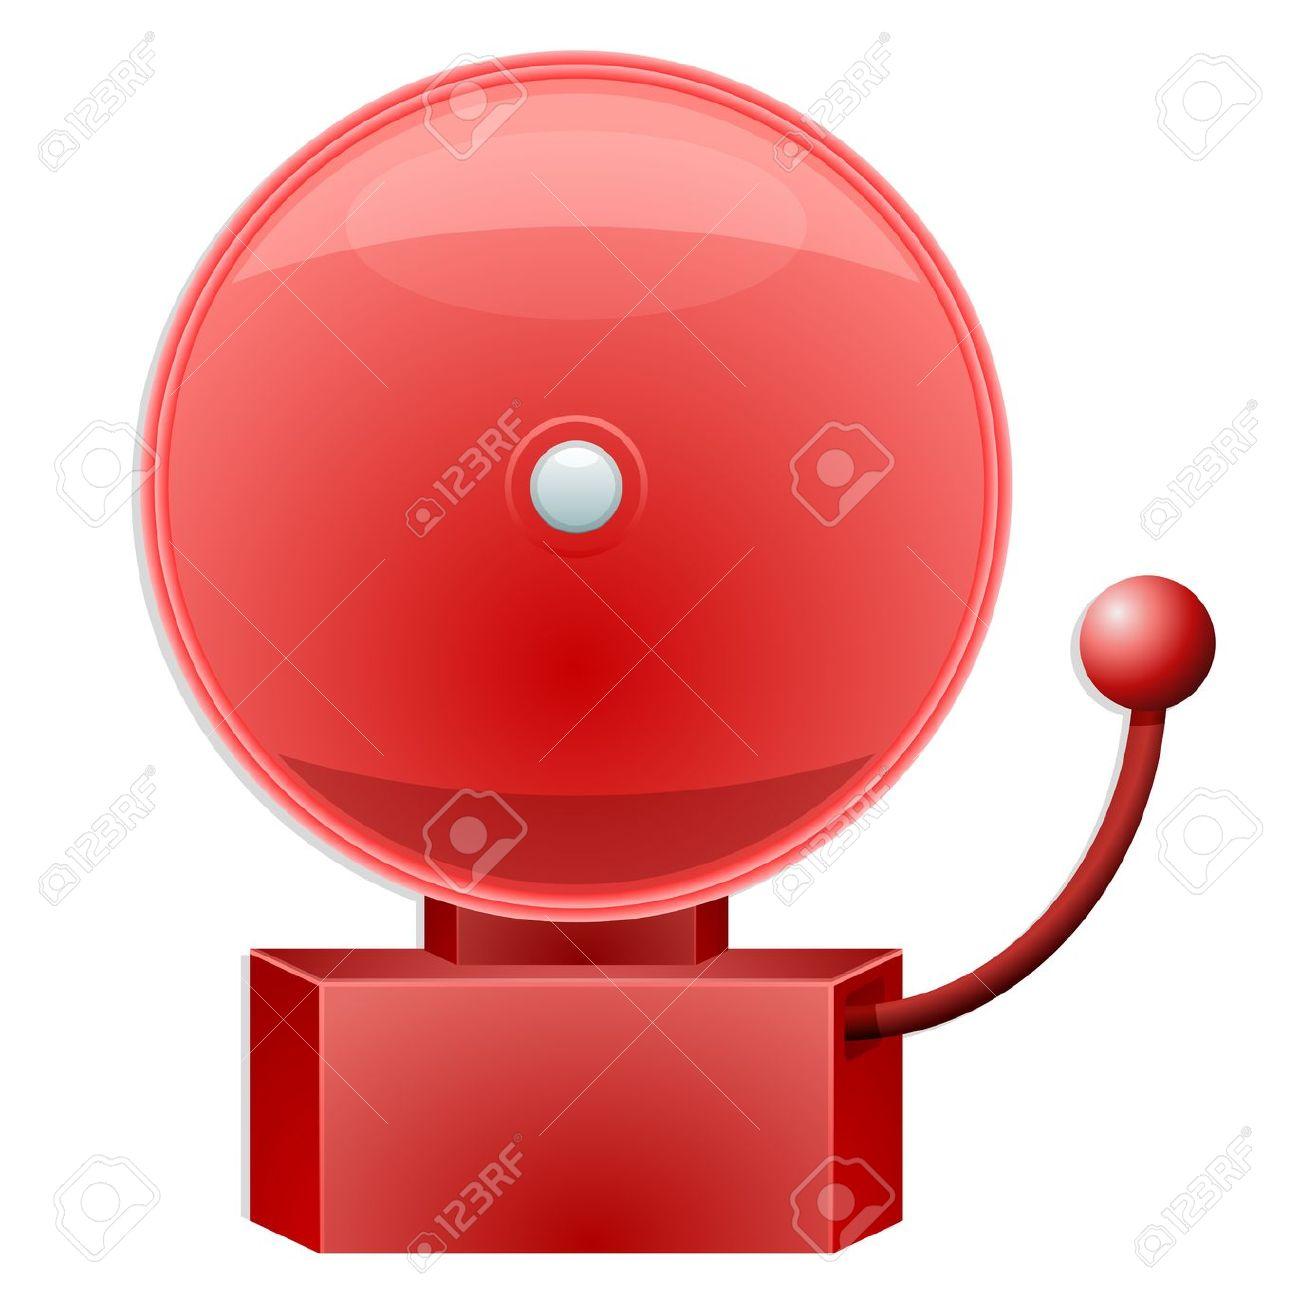 hight resolution of alarm clipart fire alarm illustration of a